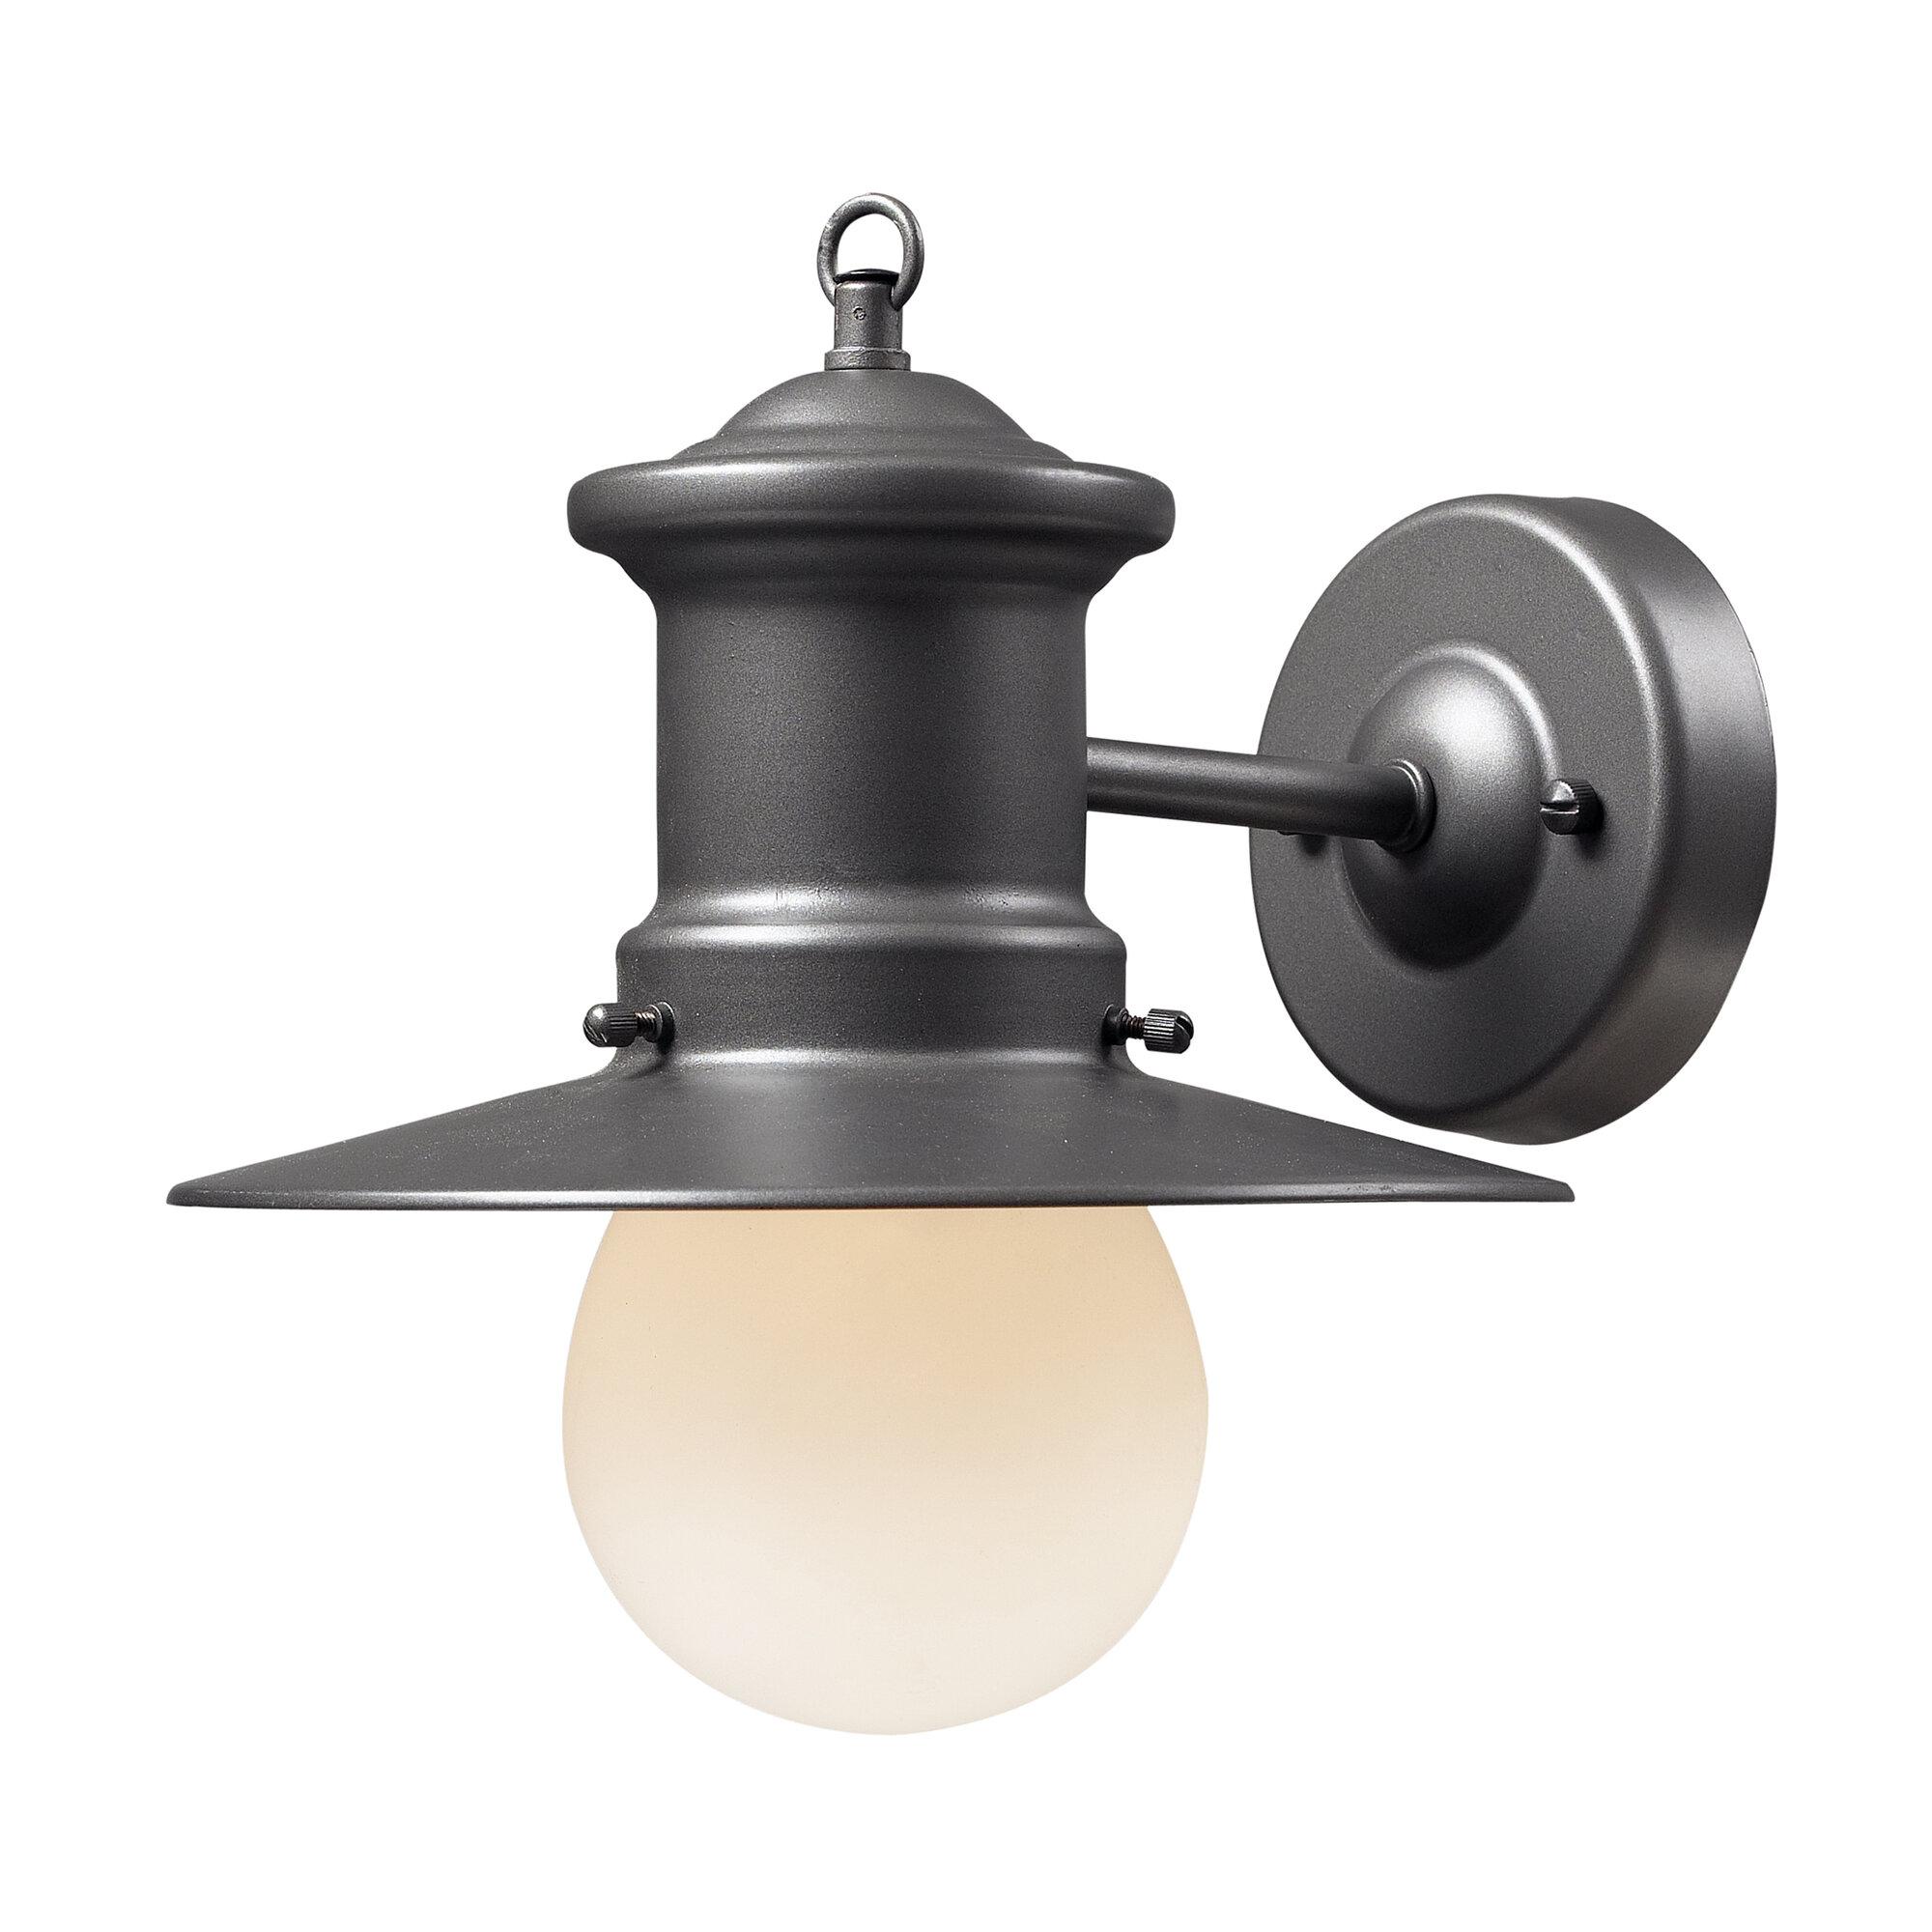 Breakwater Bay Garren 1-Light Outdoor Barn Light BKWT7702 ...